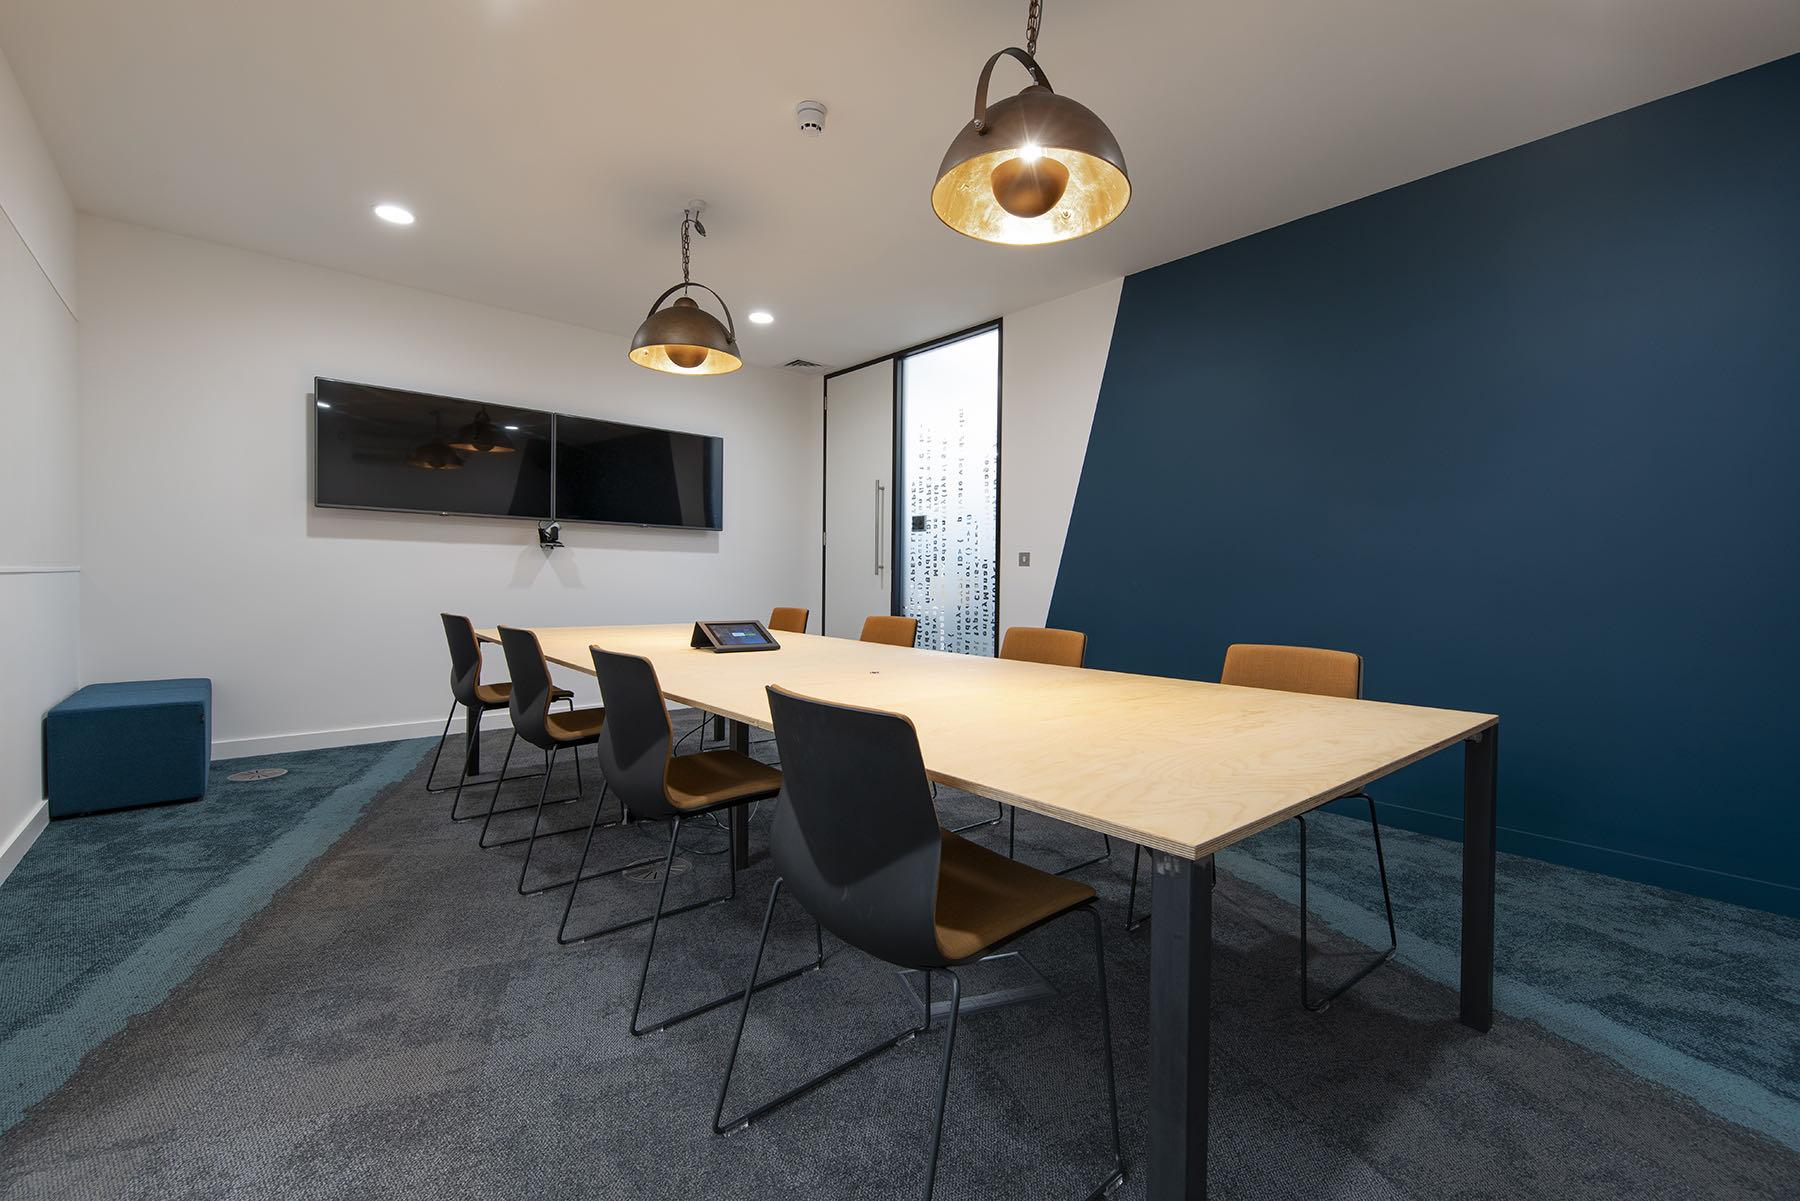 metapack-london-office-15